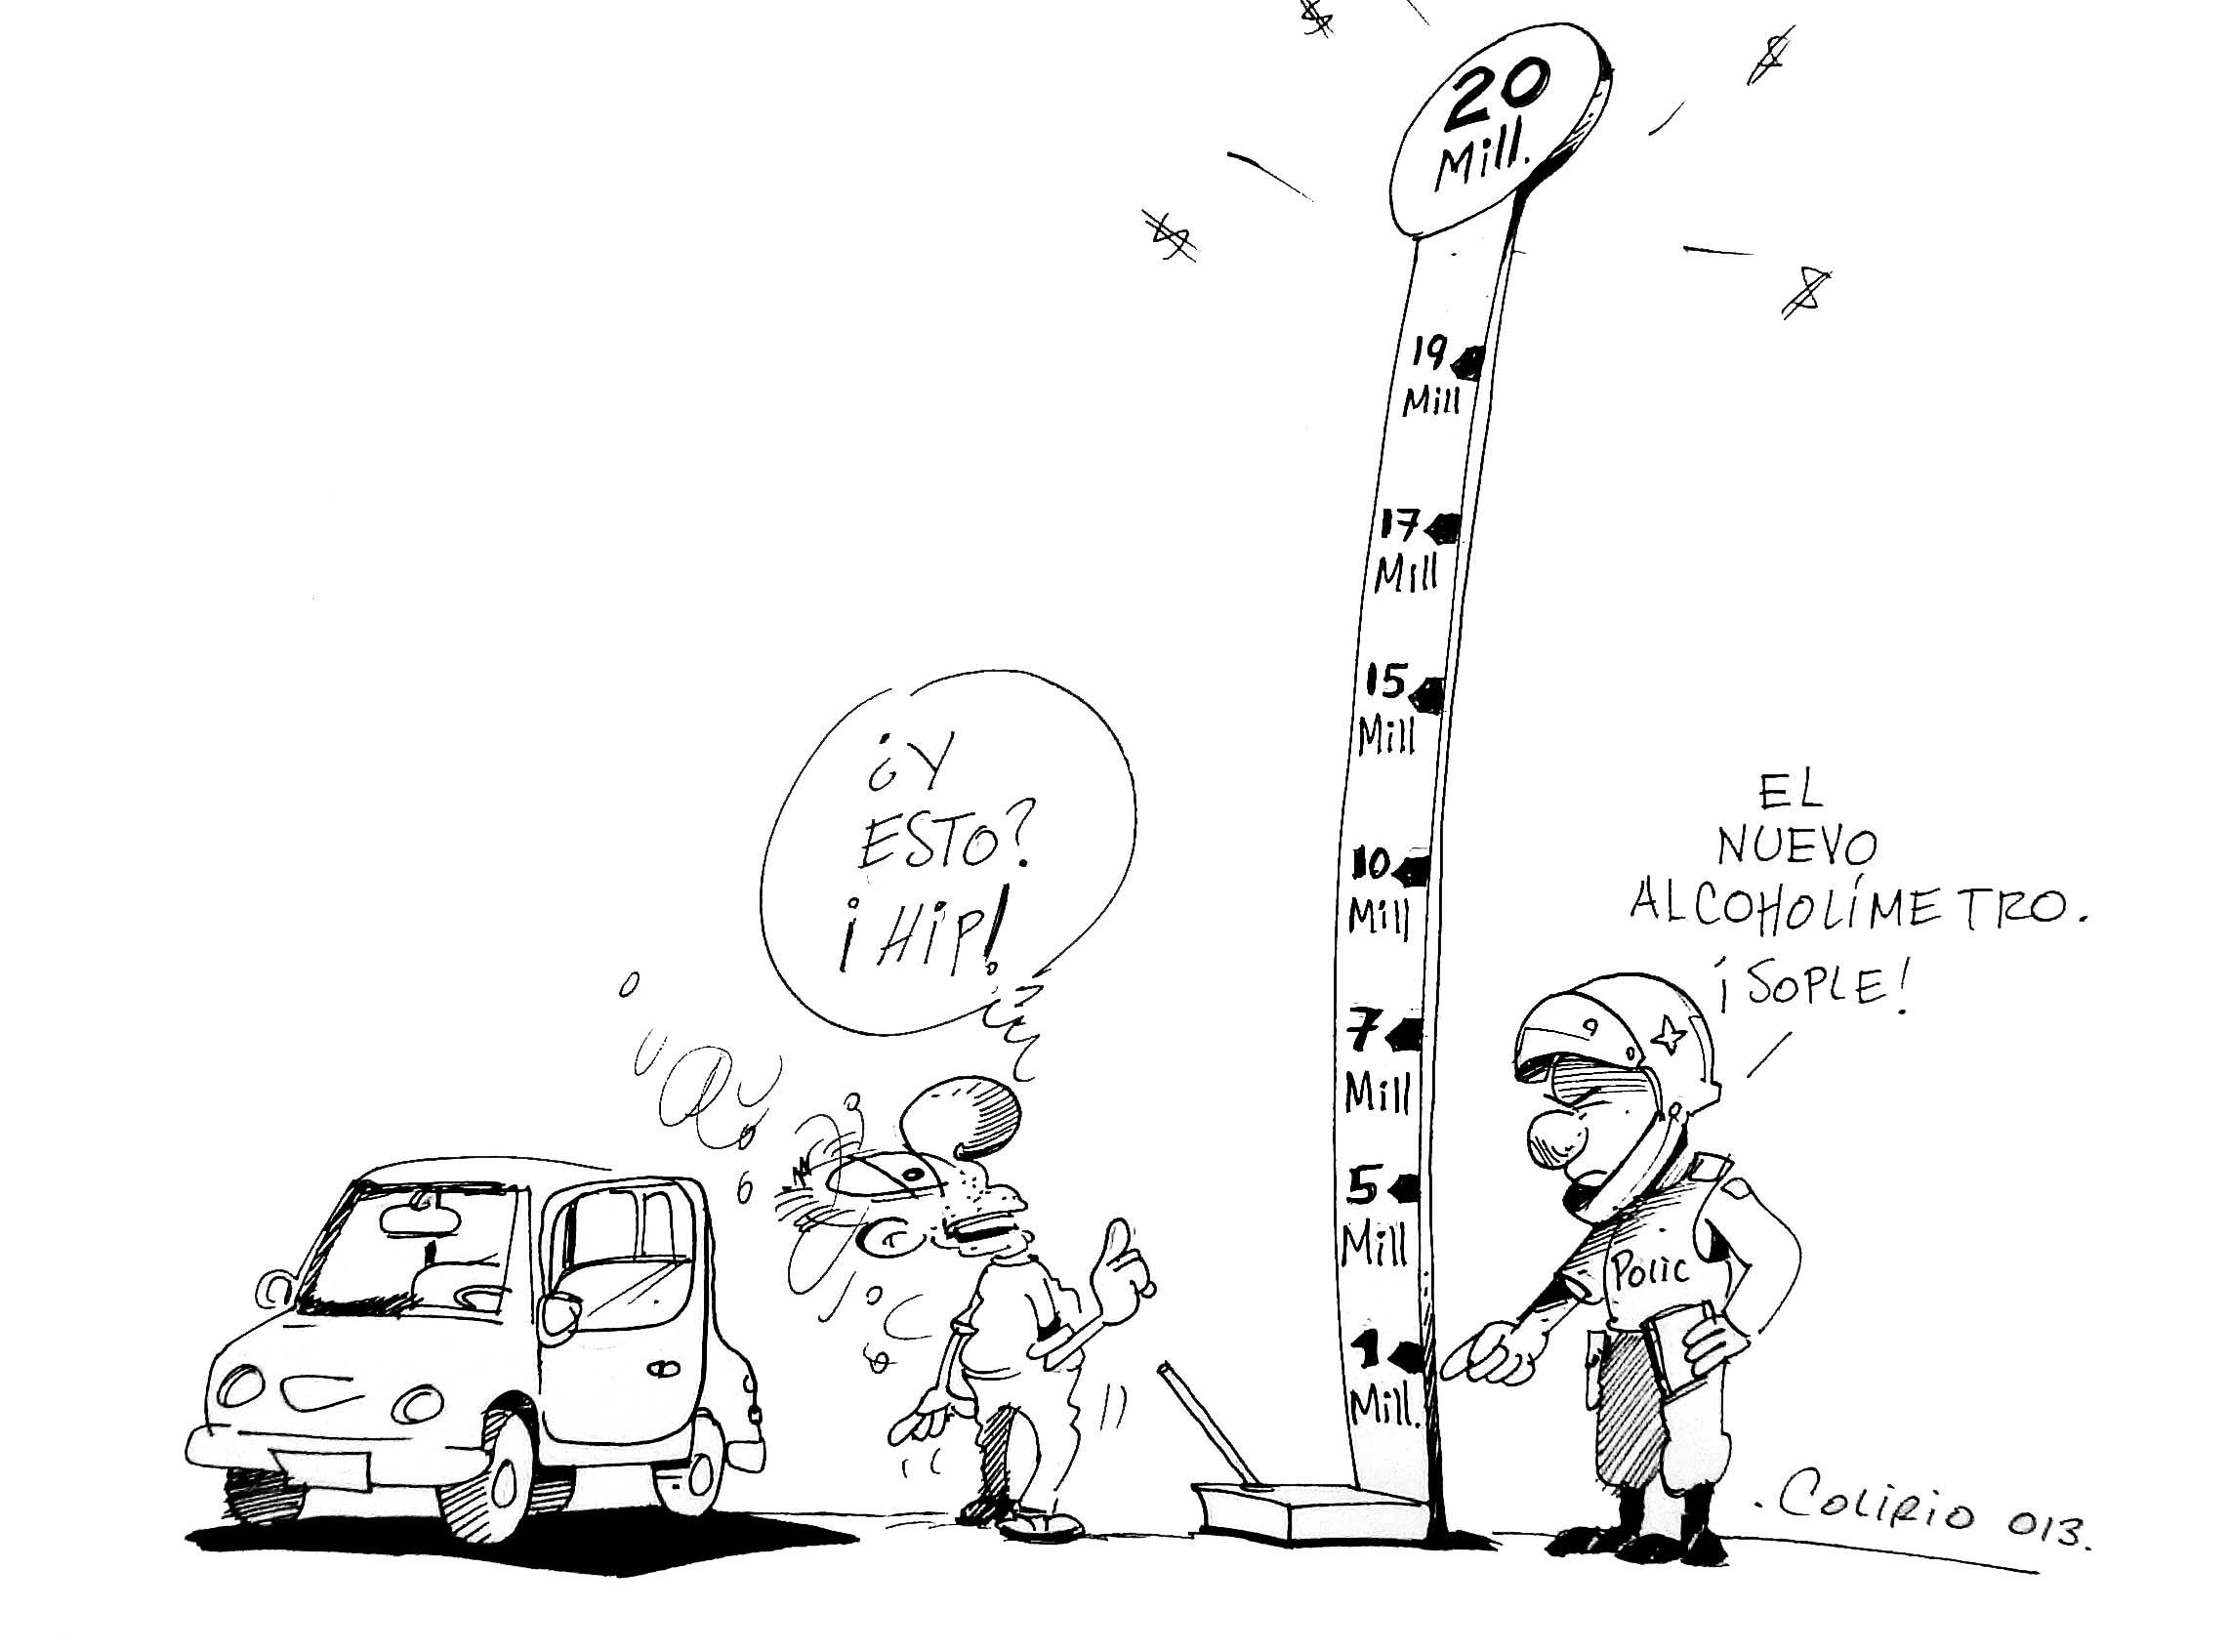 carica sabado 21 de dic de 2013